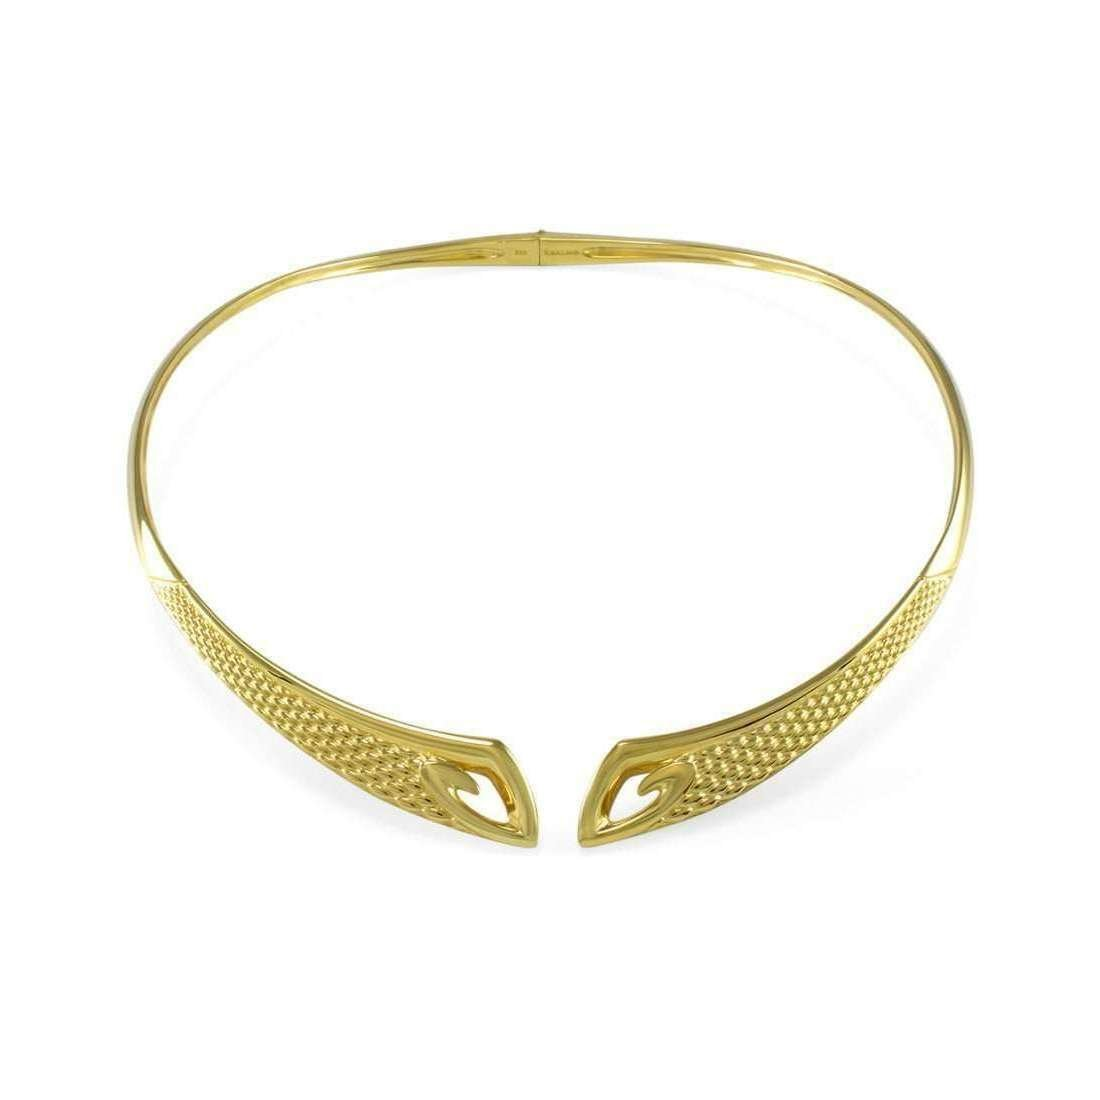 Sceptre Python Collar - Realm